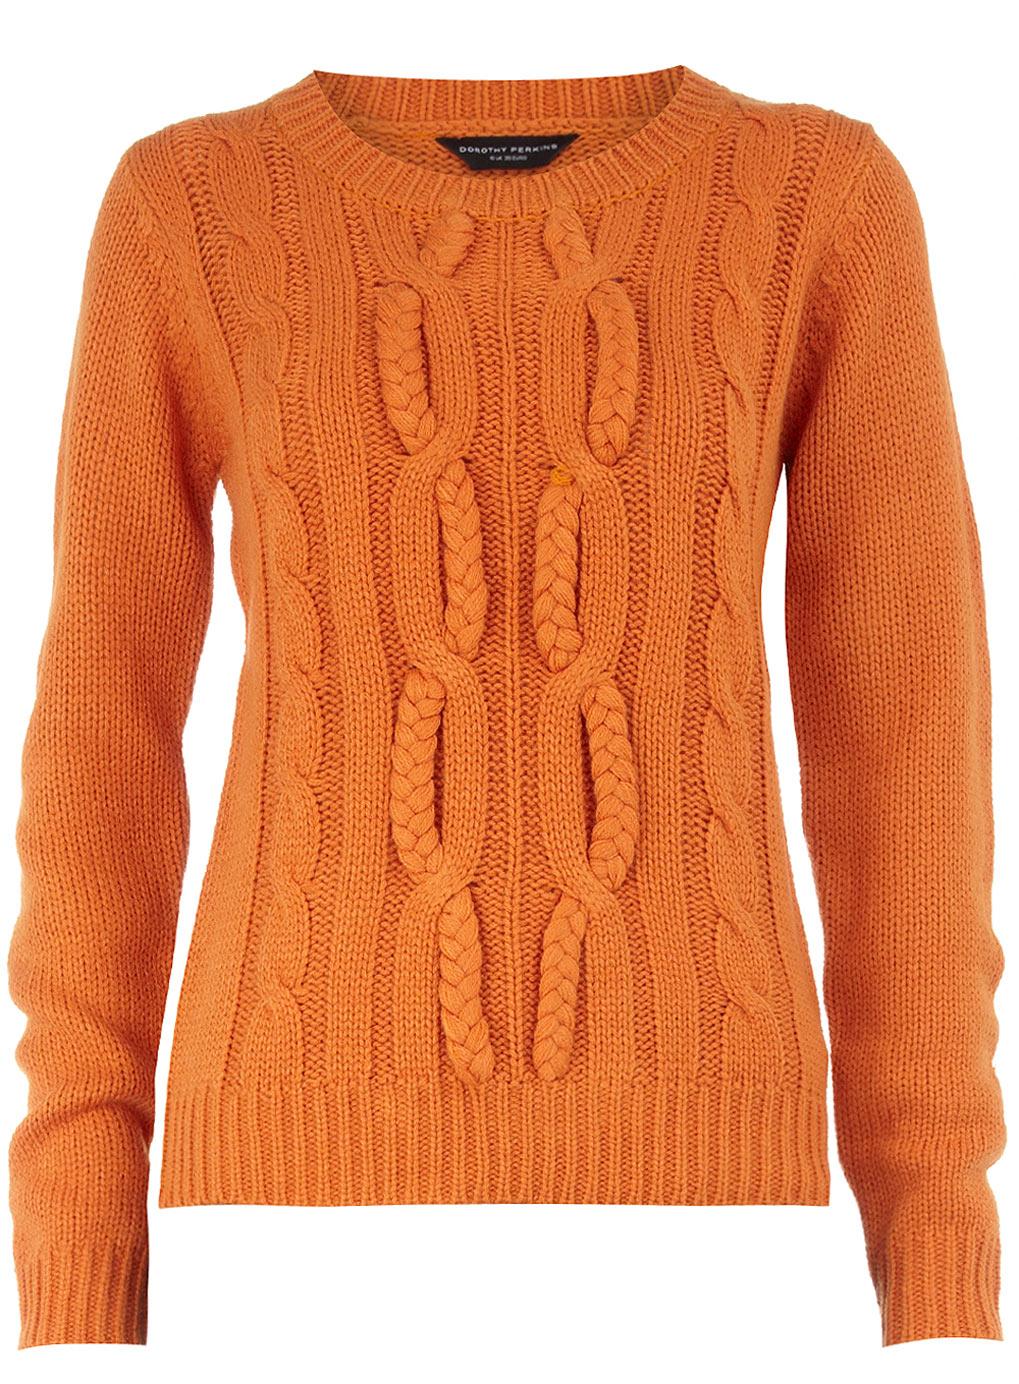 Orange Cabled Sweater – Craftbnb